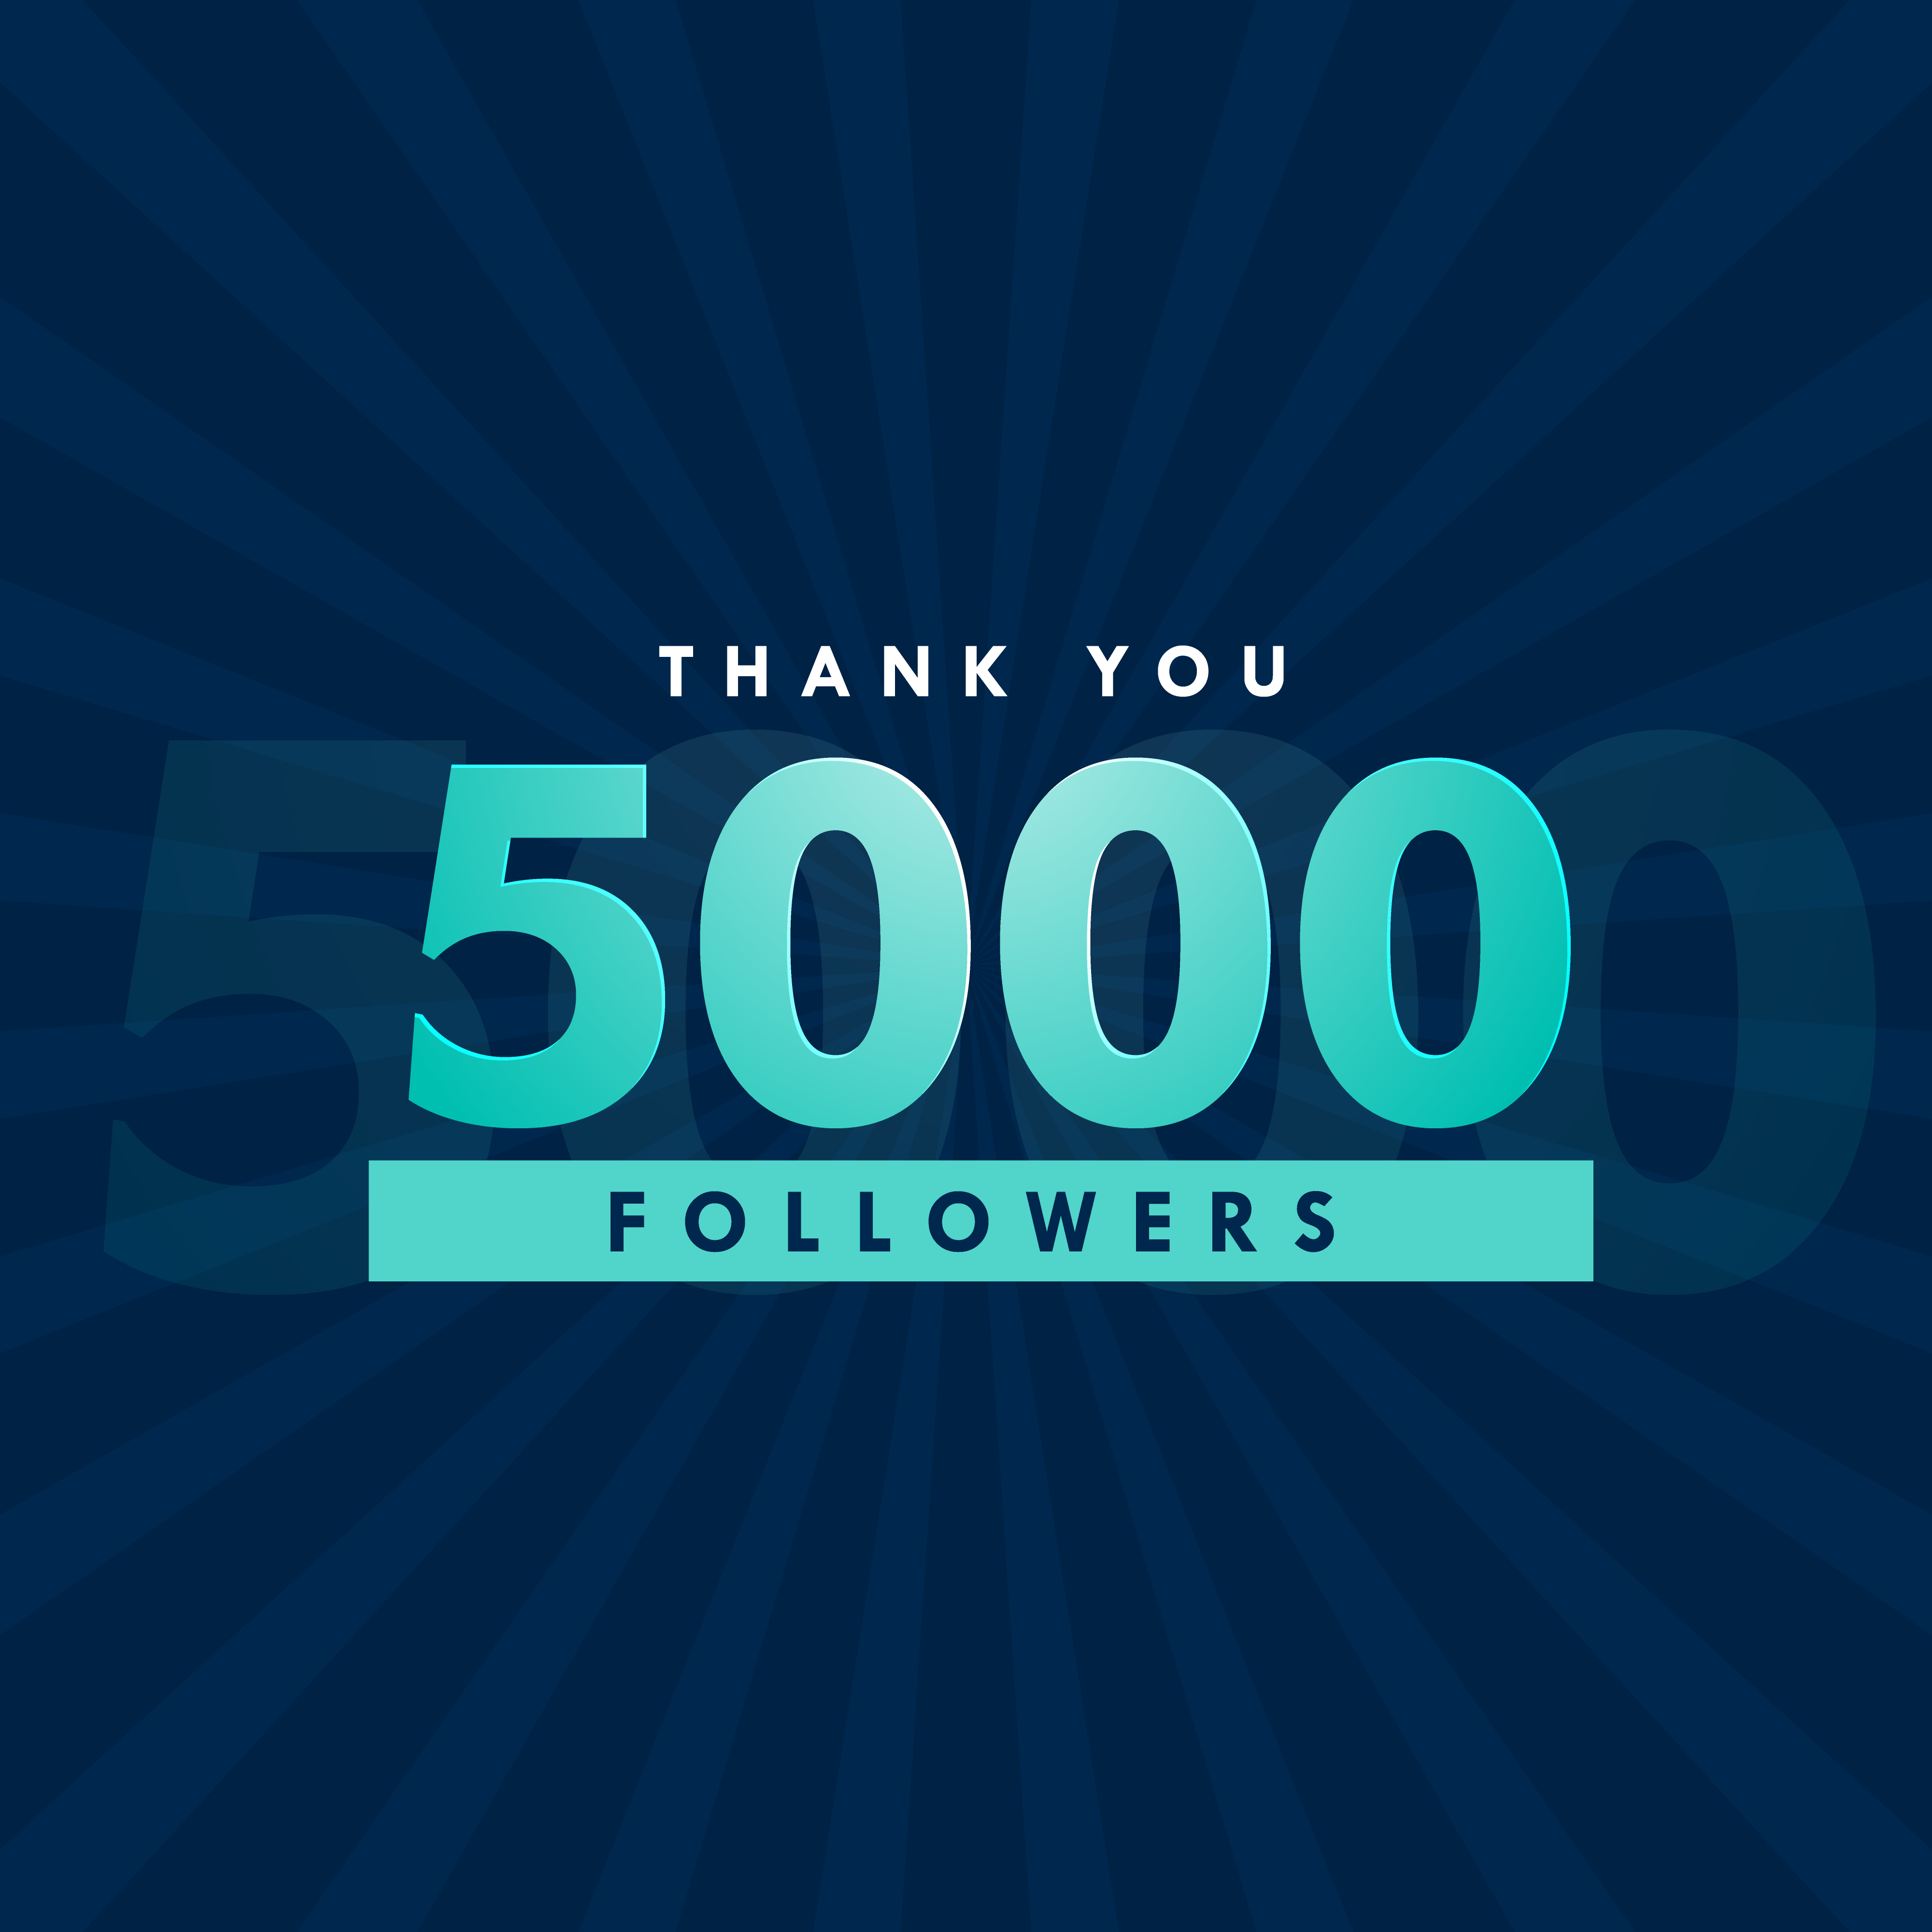 1000 follower celebration - 2 5